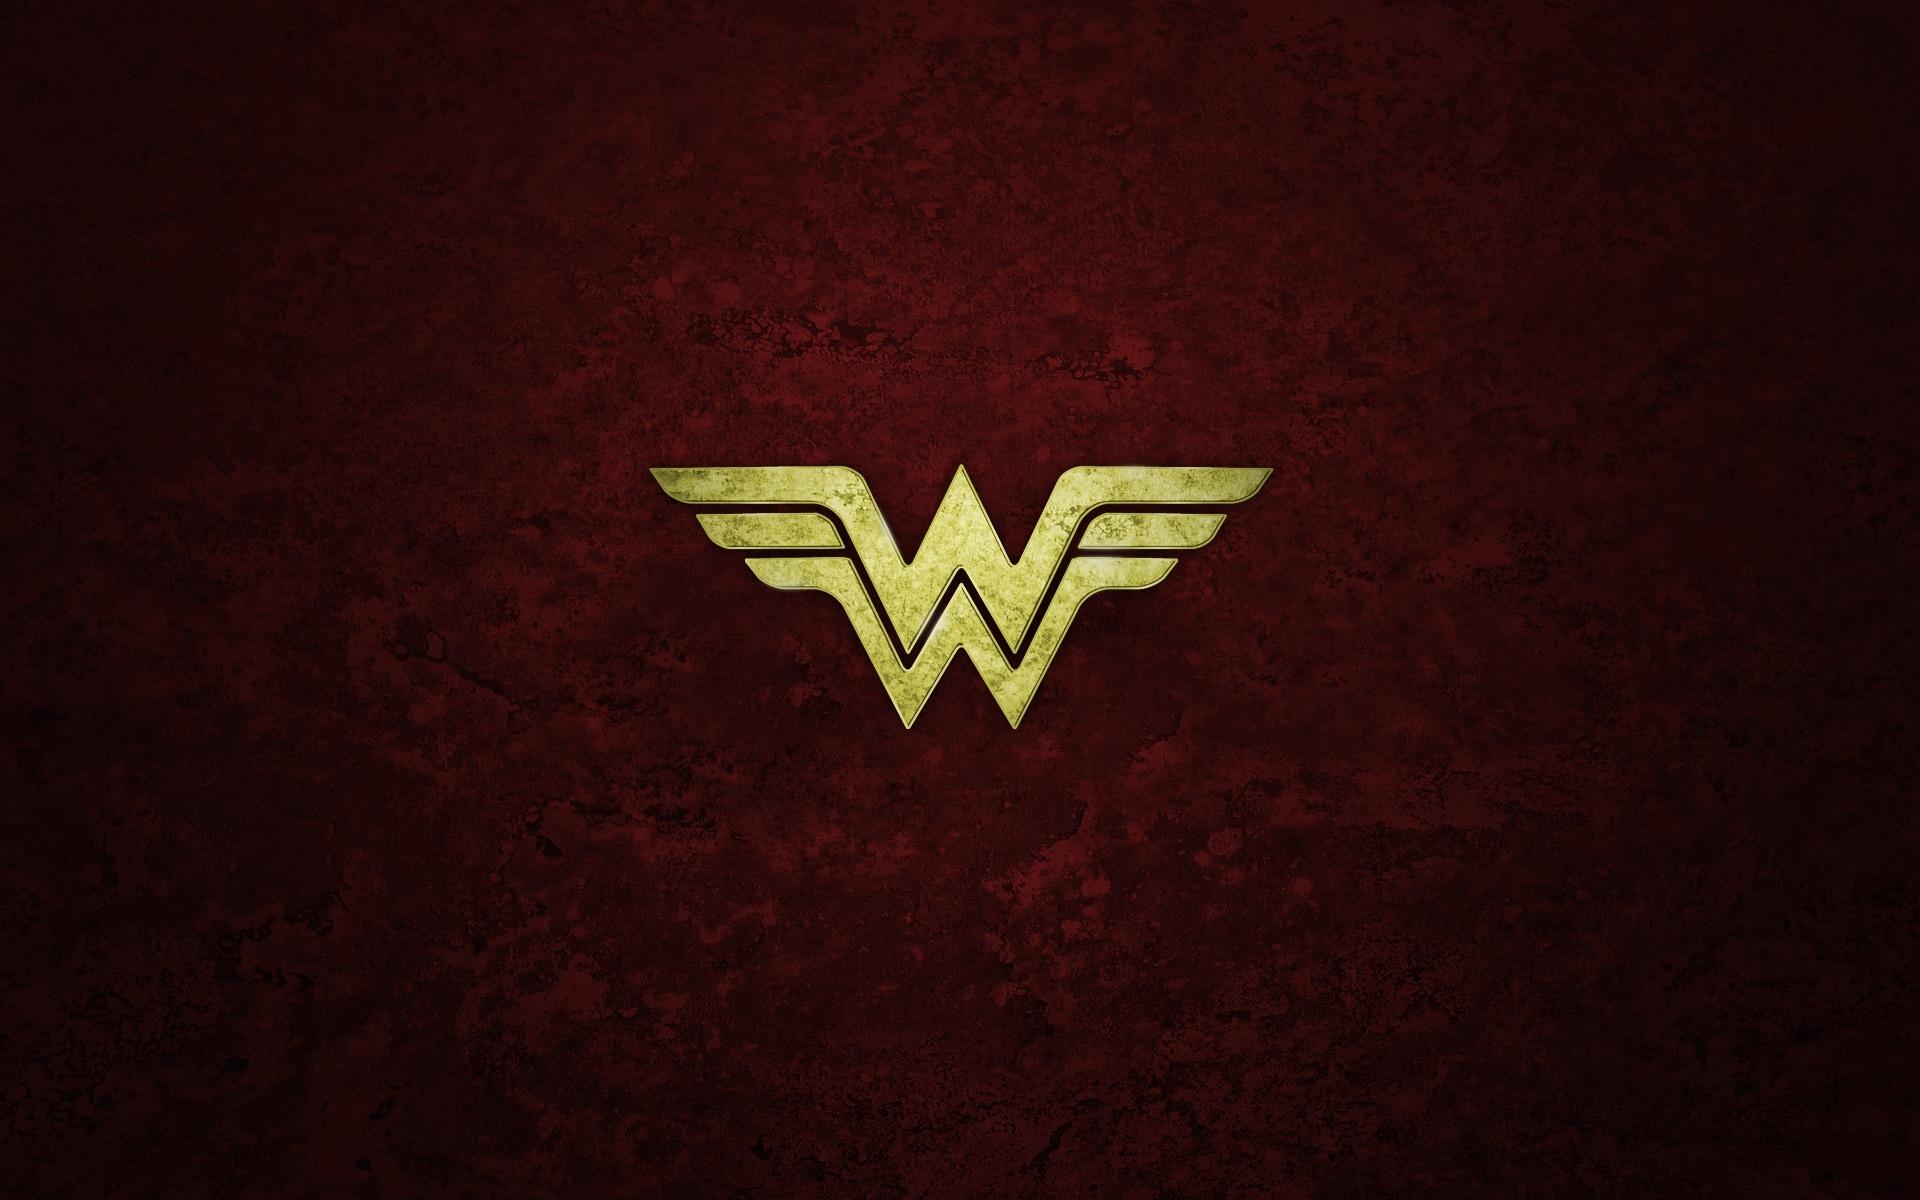 dc comics, symbol, logos, wonder woman :: wallpapers